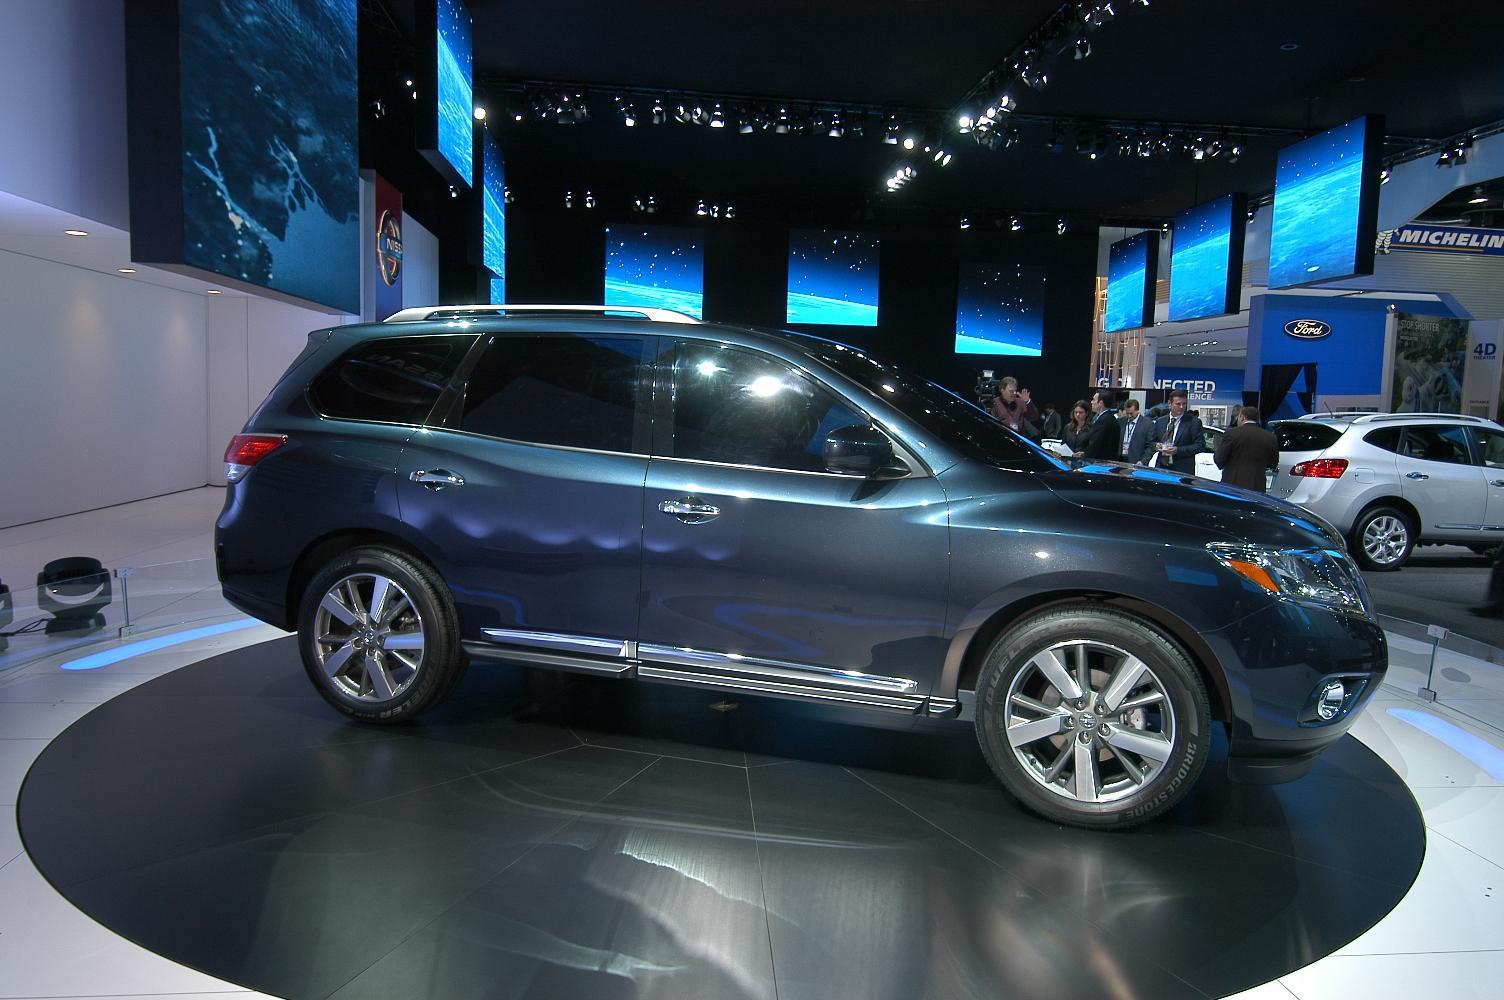 Nissan Pathfinder NAIAS 2012 7